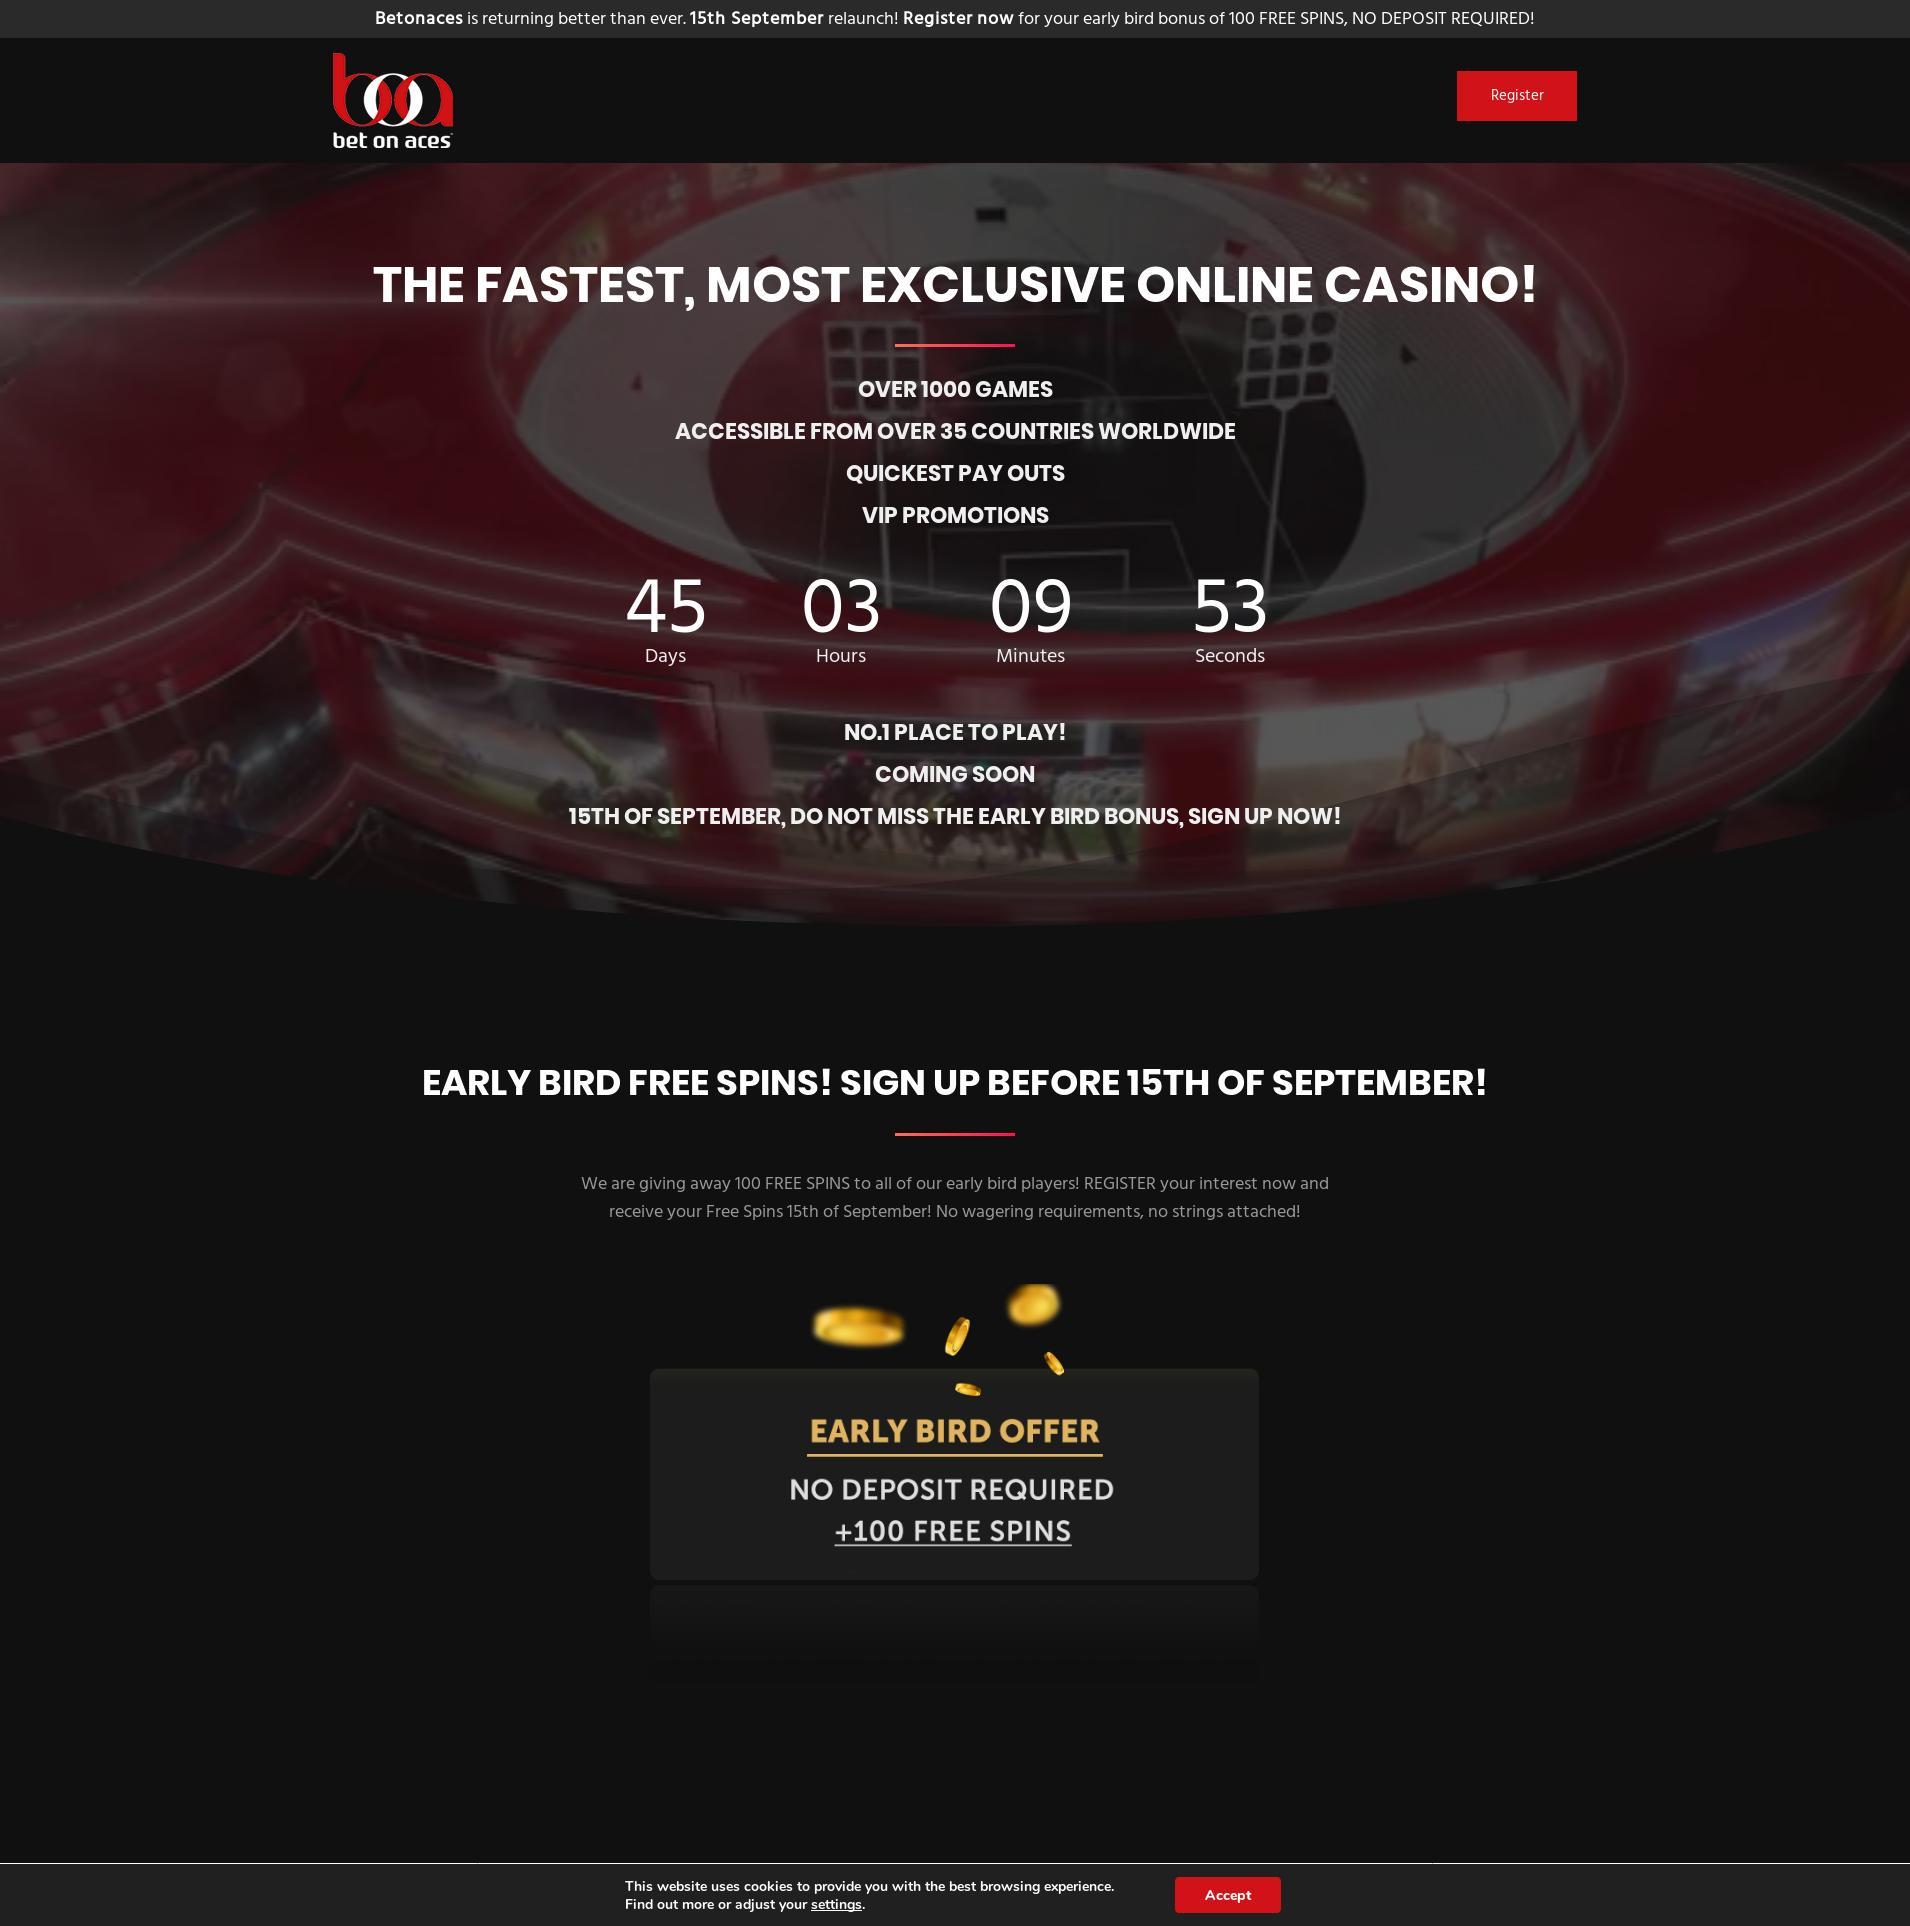 Casino screen Lobby 2019-08-01 for United Kingdom